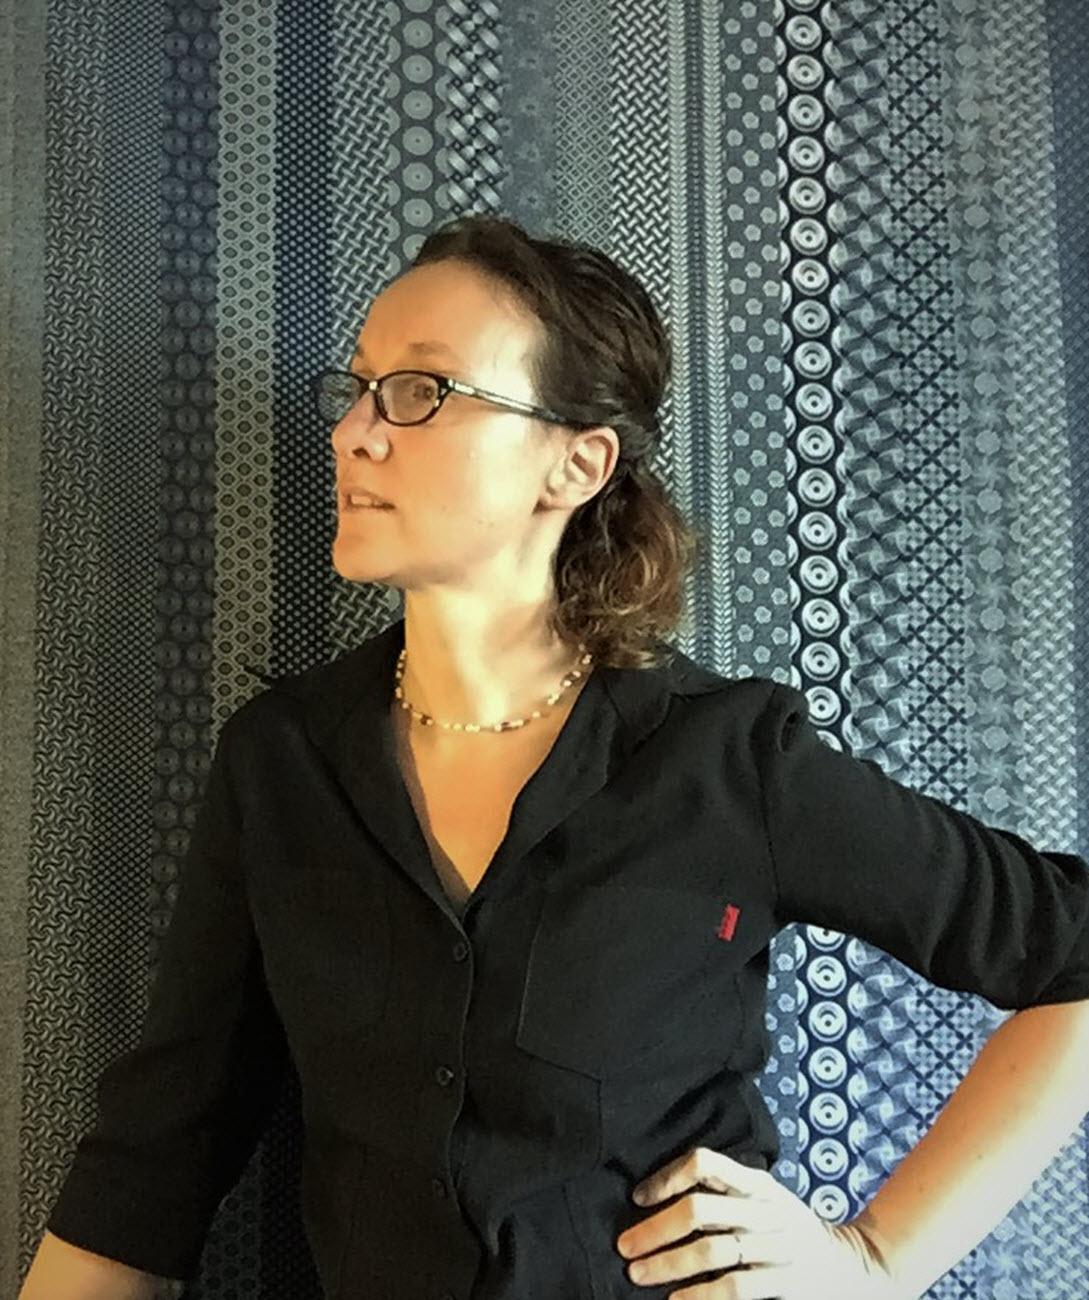 Dina Belluigi